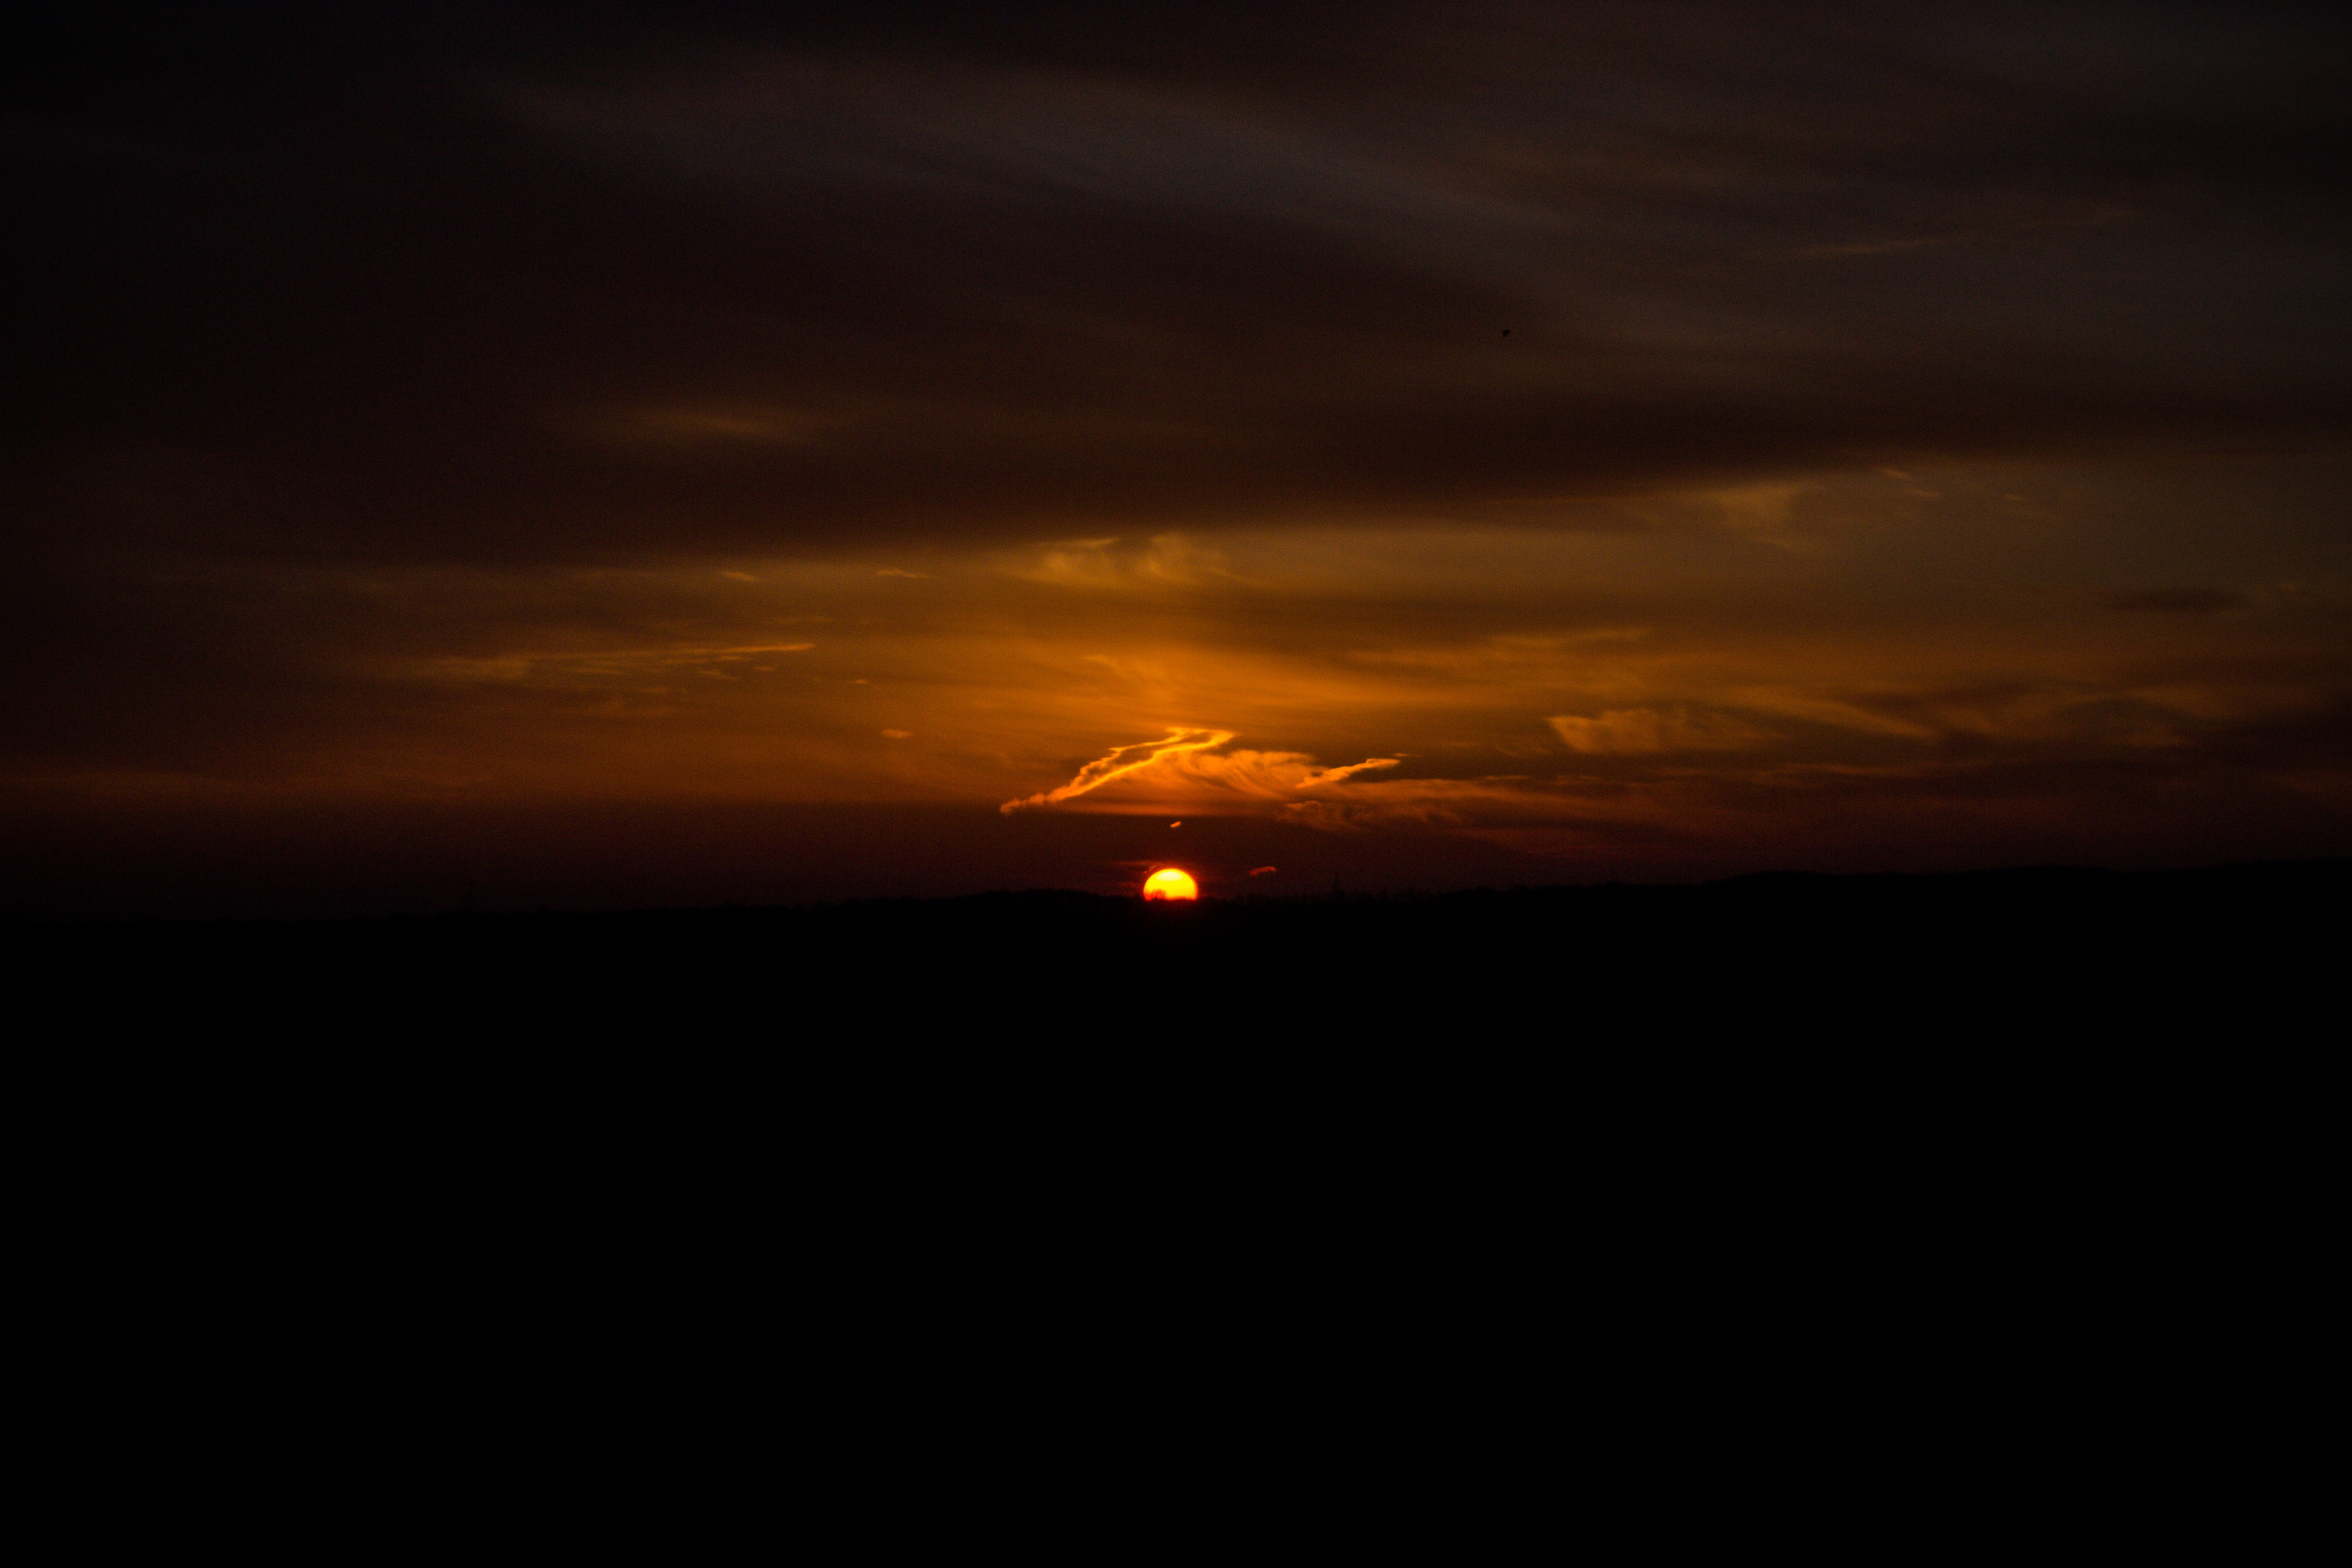 Dark Sunset Evening 4k, HD Nature, 4k Wallpapers, Images ...